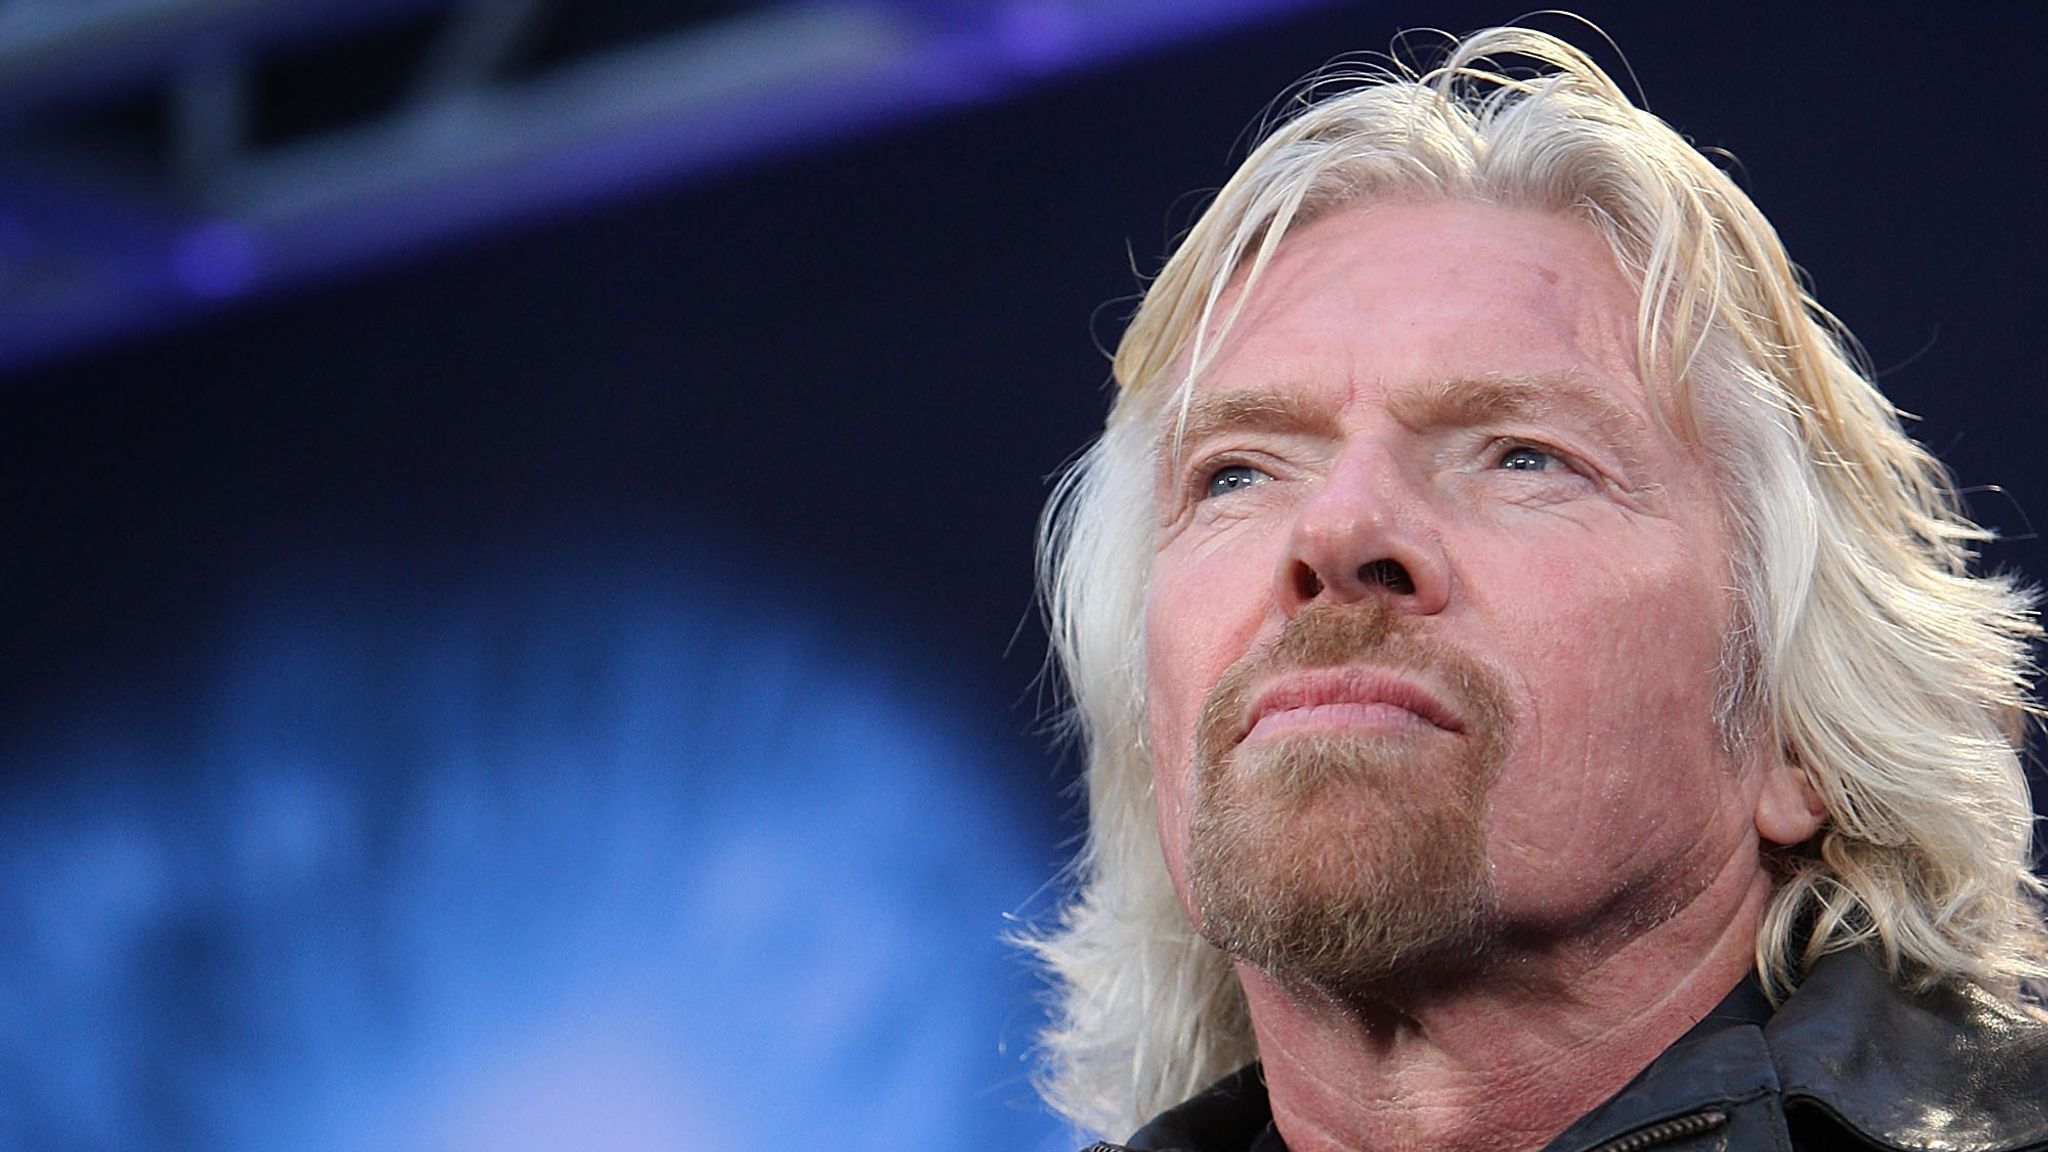 Bukan Persaingan Tapi Saling Mendoakan, Richard Branson tentang Lomba dengan Jeff Bezos